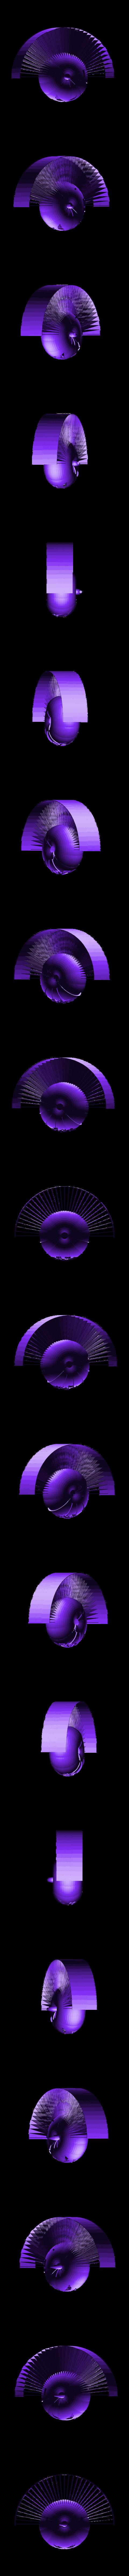 calabazasinpelo1.stl Download free STL file Hairy Pumpkin • 3D printer model, sketchprint3d